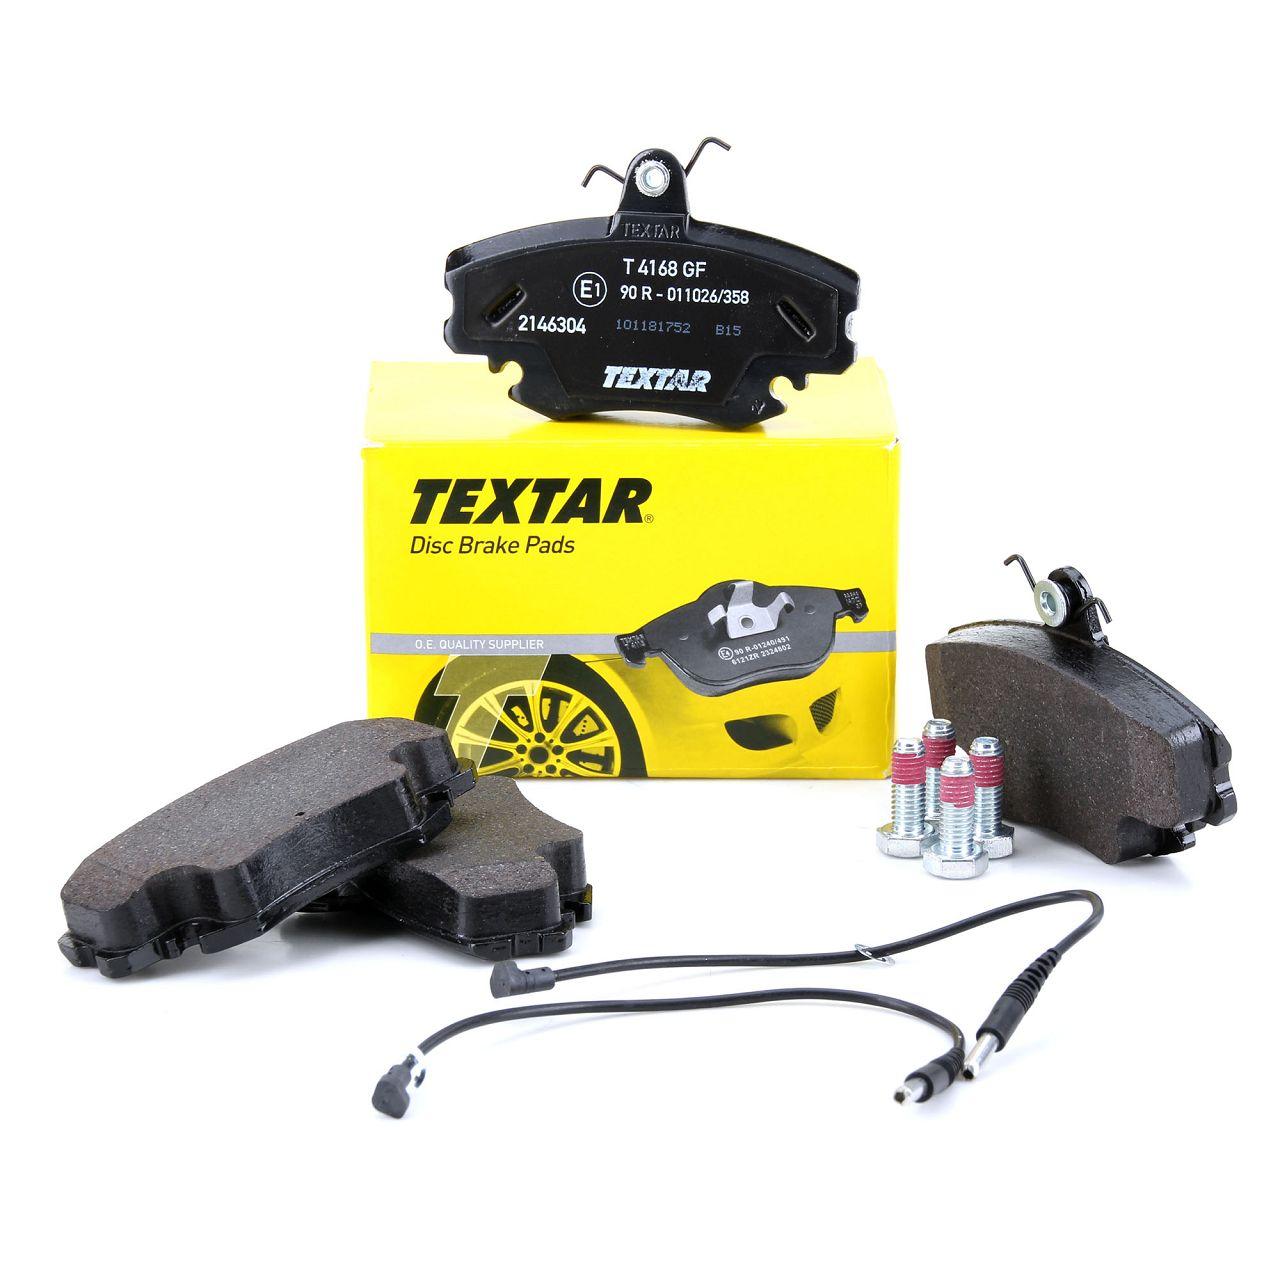 TEXTAR Bremsbeläge Bremsklötze + Wako für Dacia Peugeot Renault vorne